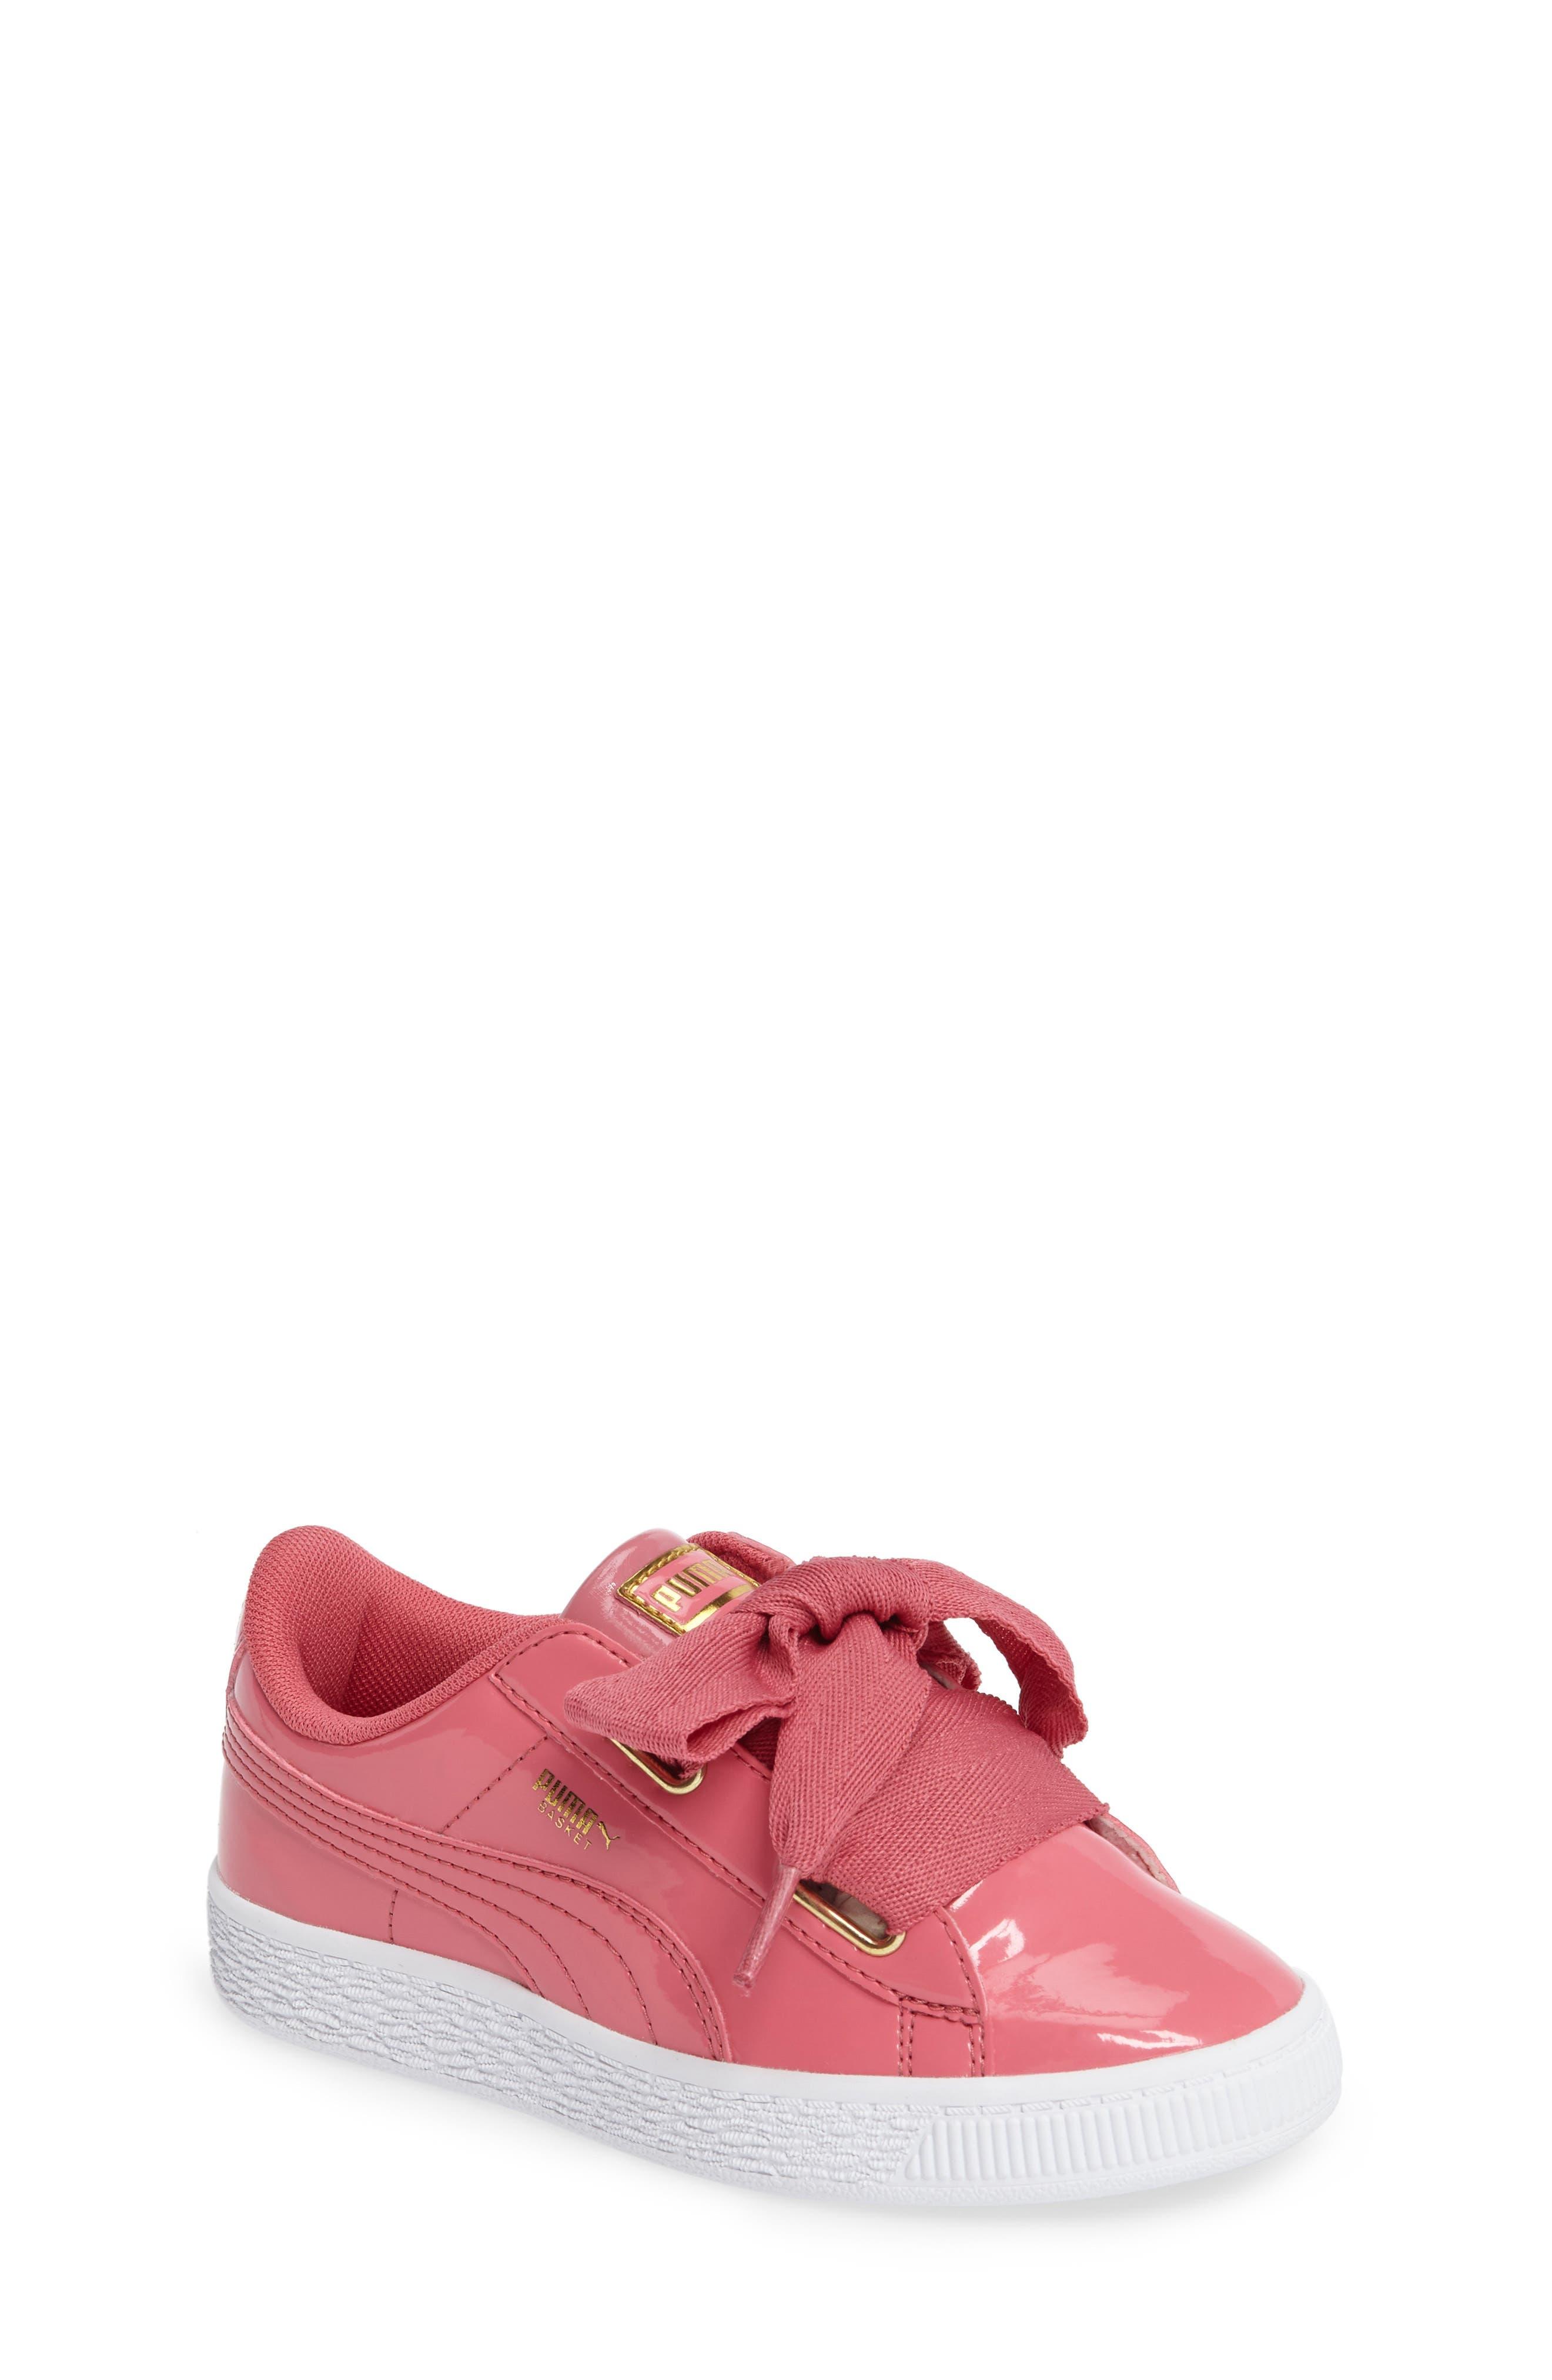 puma sneaker baby weiss